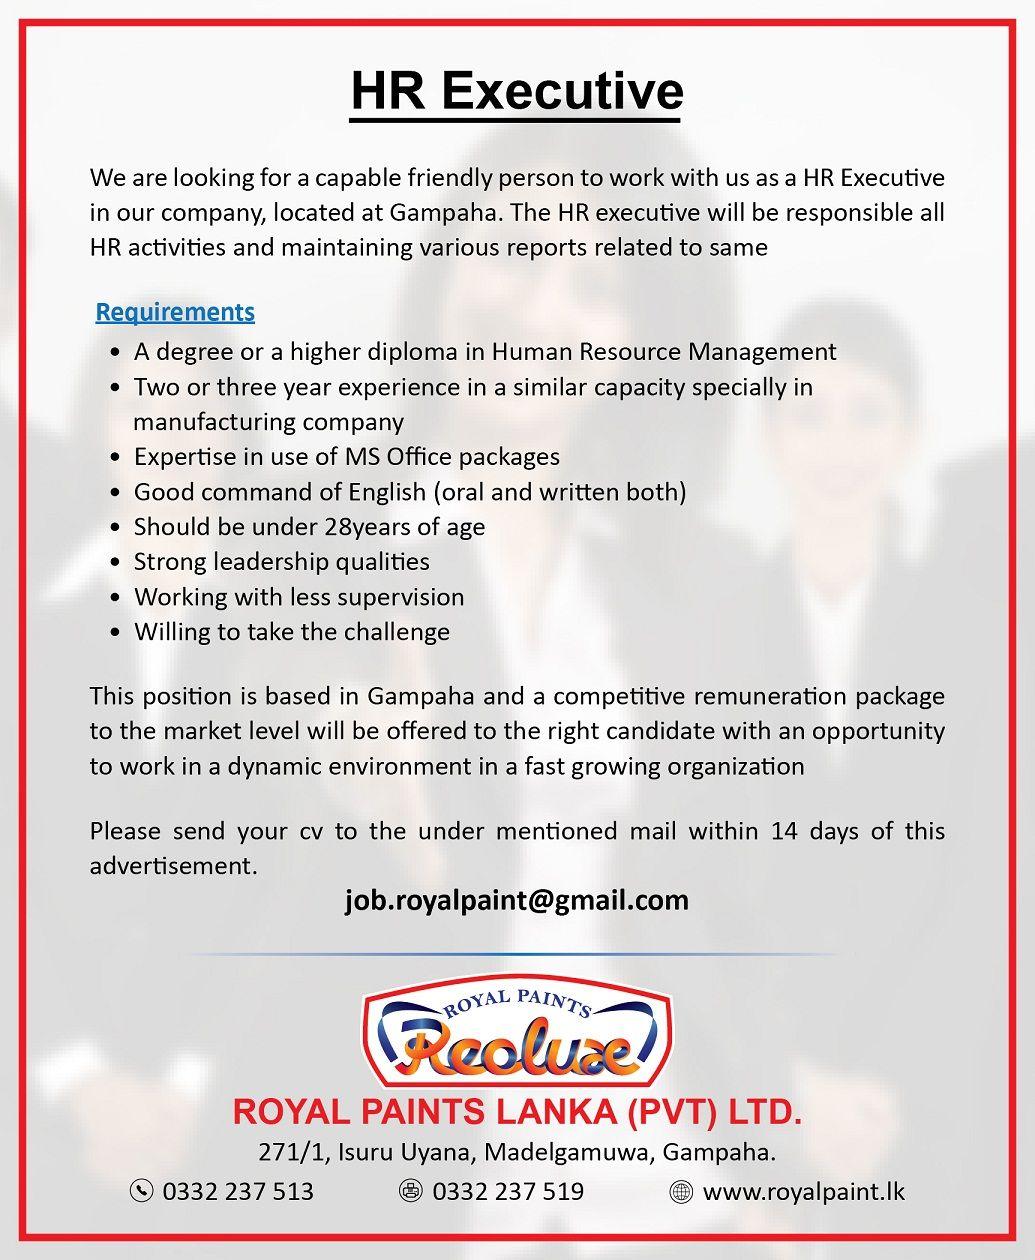 hr executive at royal paints lanka pvt career first hr executive at royal paints lanka pvt career first